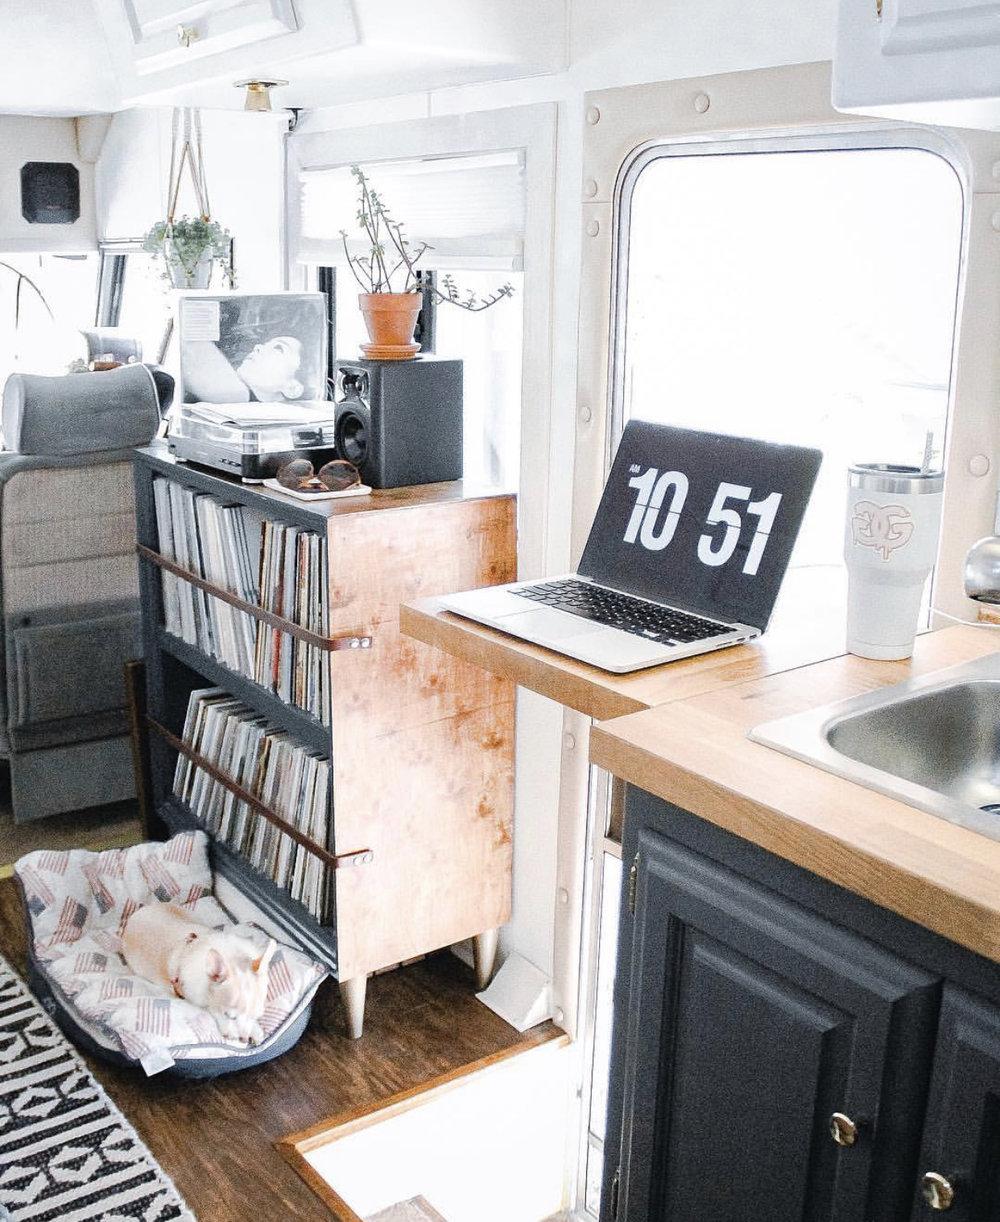 The Entrance and Folding Desk/Countertop